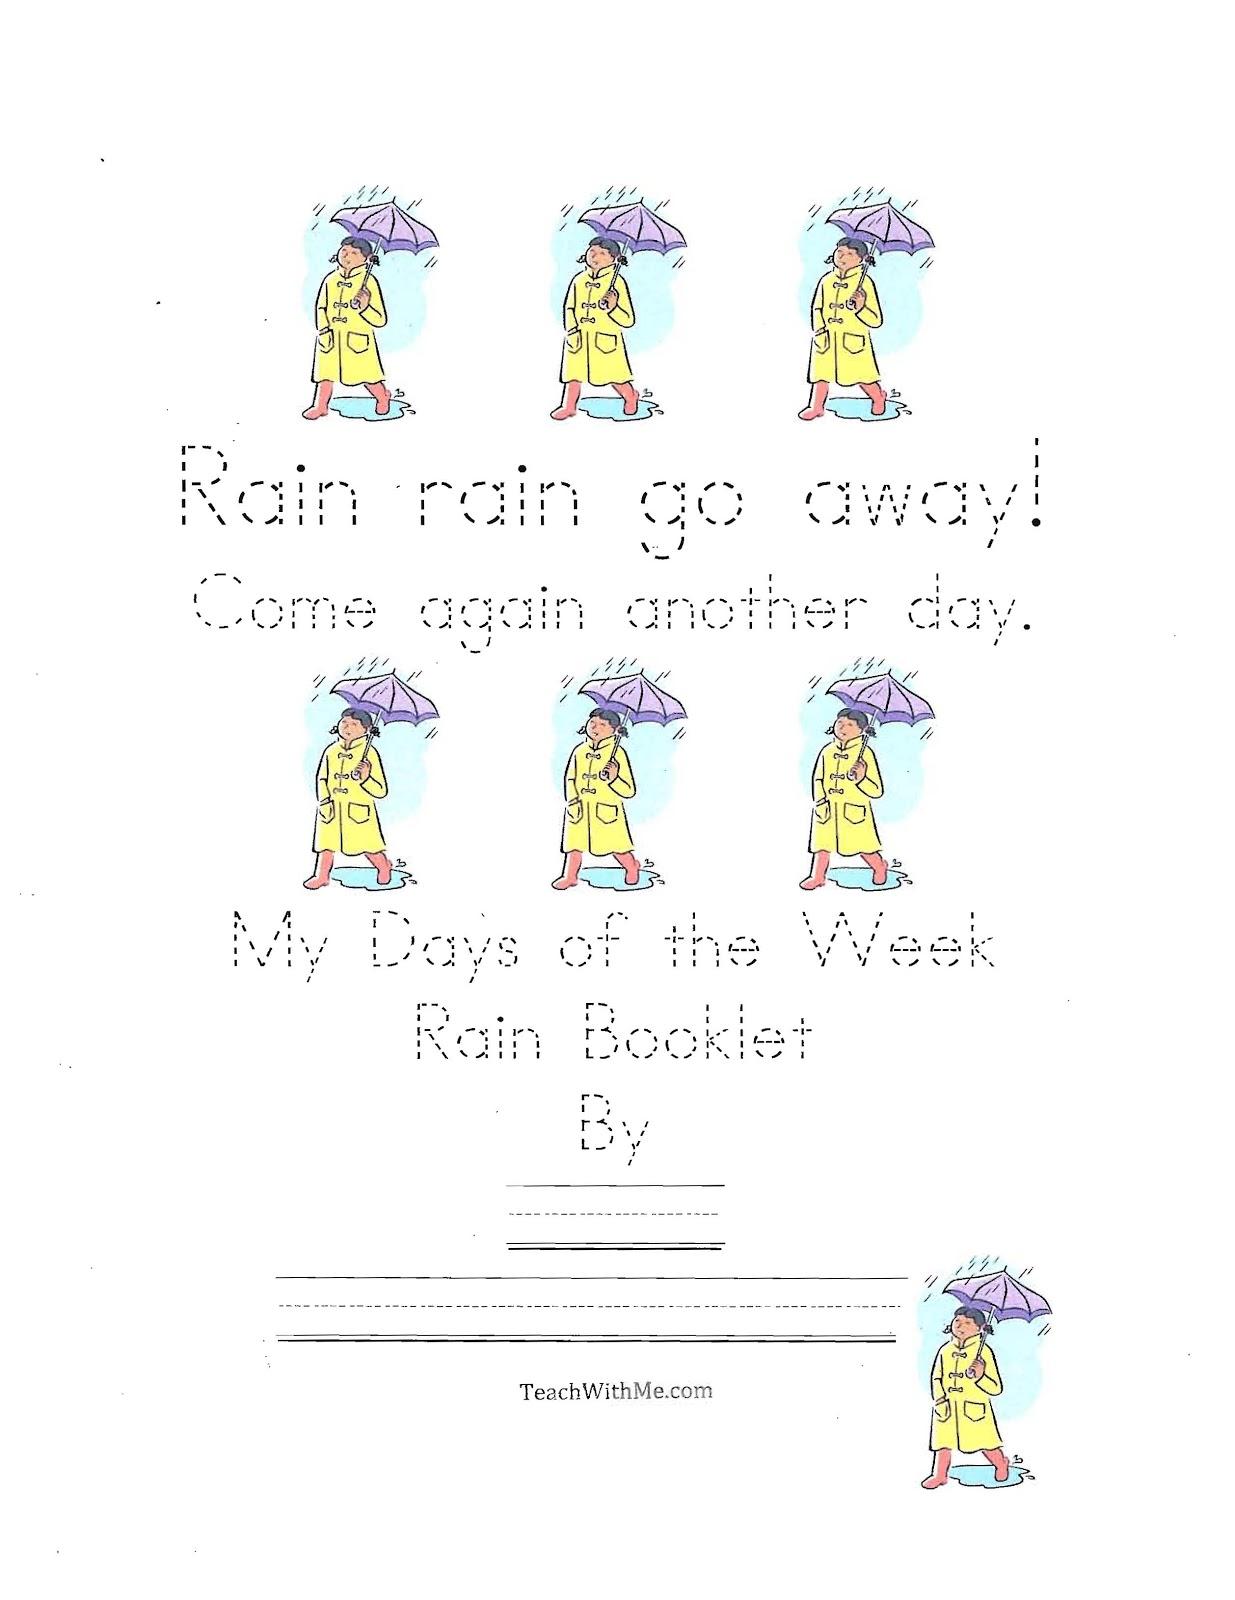 Classroom Freebies Rain Rain Go Away Easy Reader Booklet